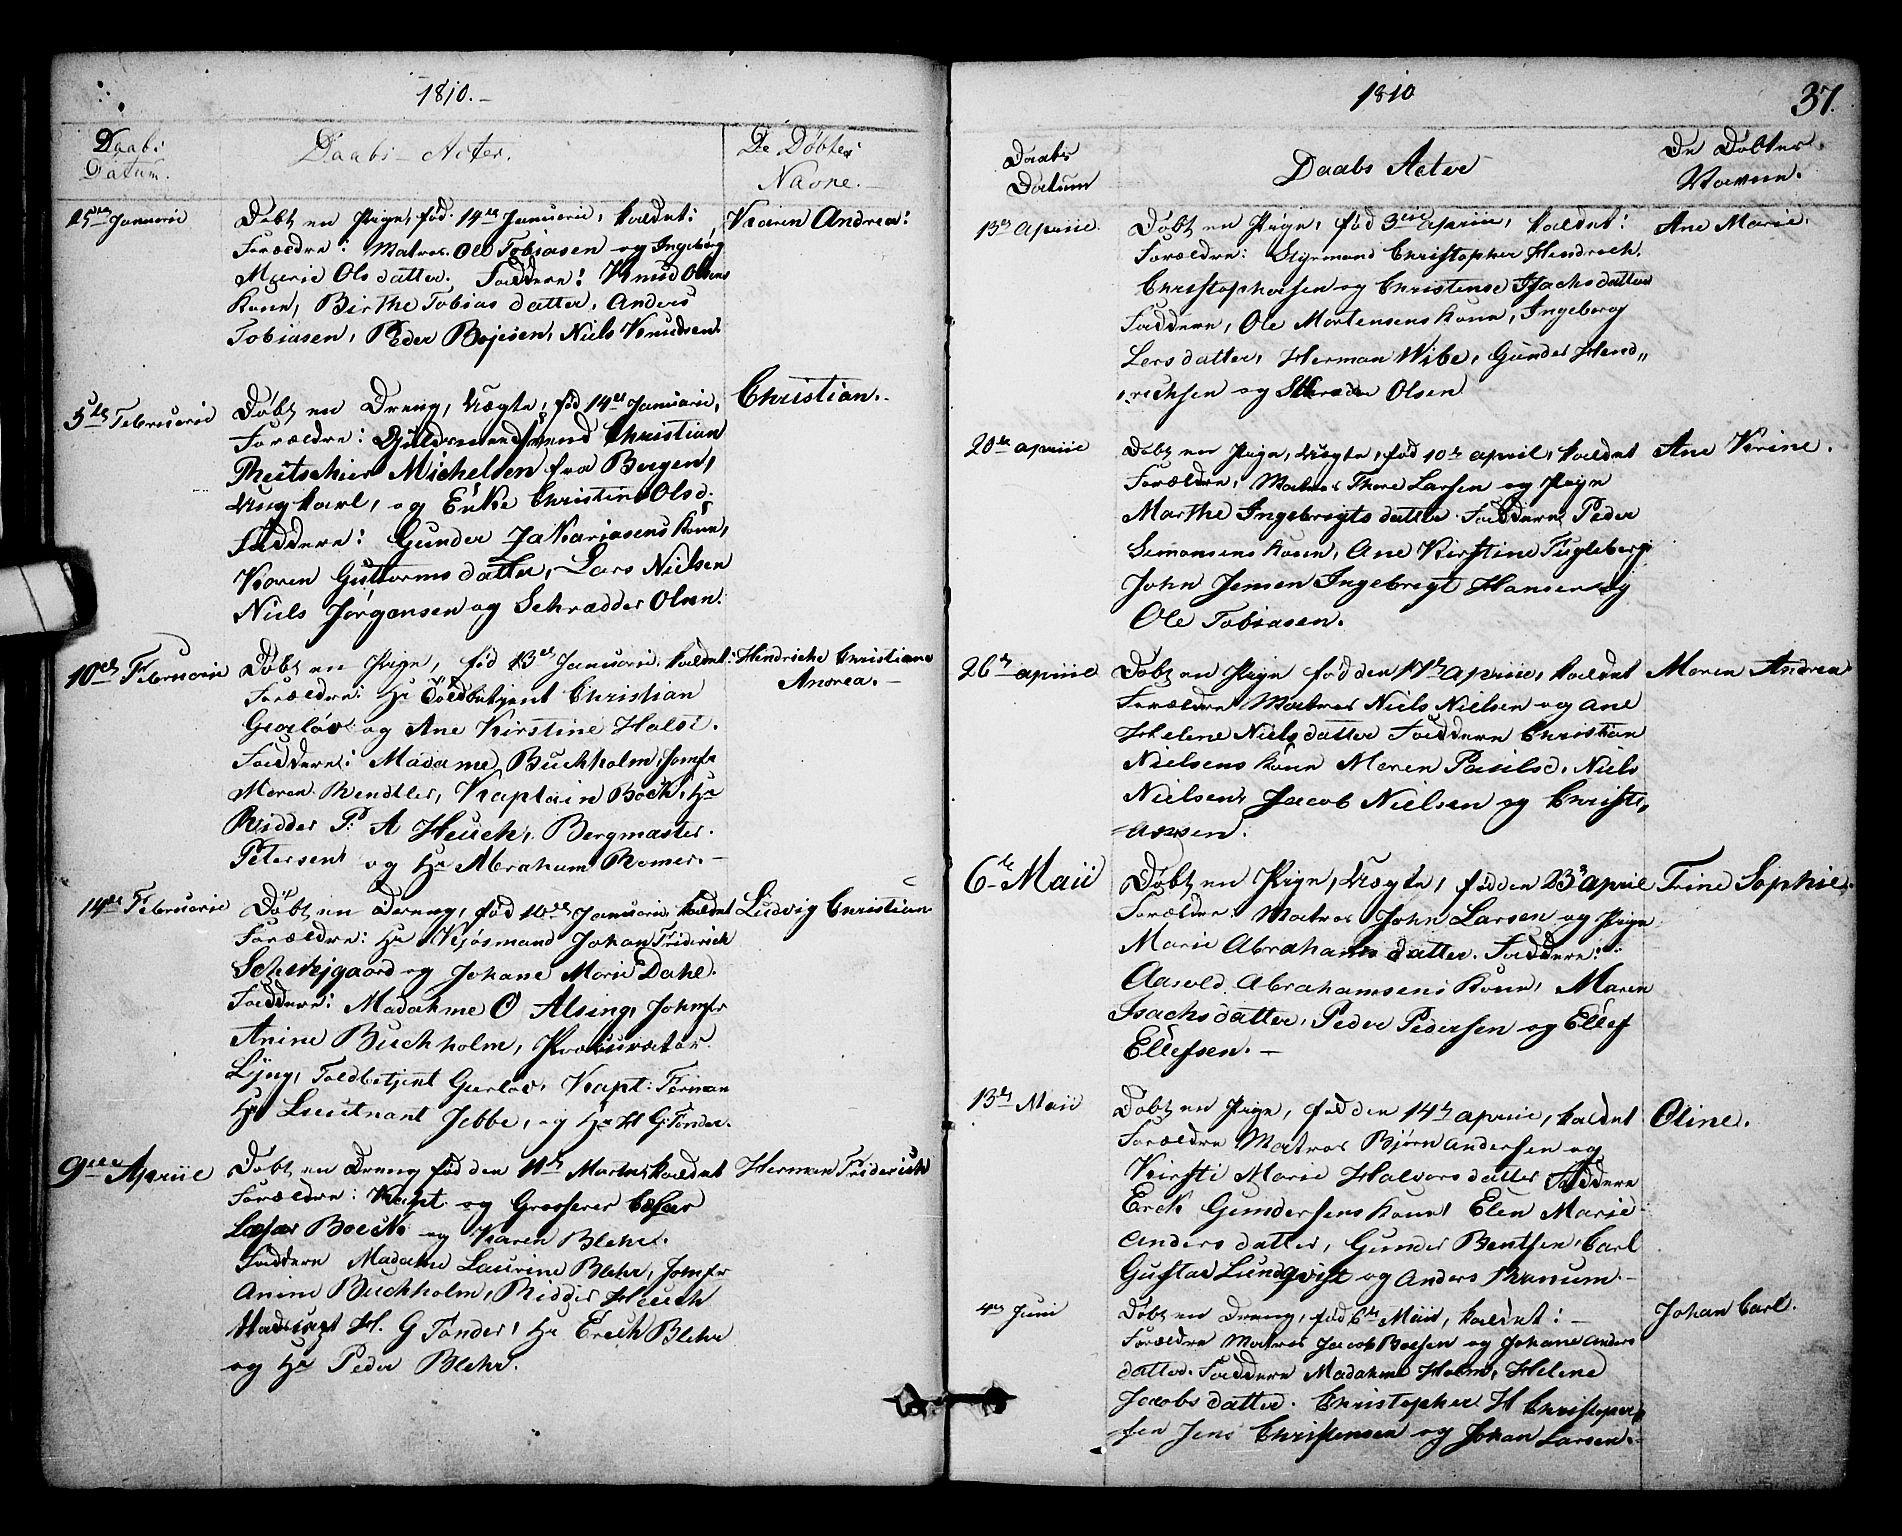 SAKO, Kragerø kirkebøker, F/Fa/L0003: Ministerialbok nr. 3, 1802-1813, s. 37